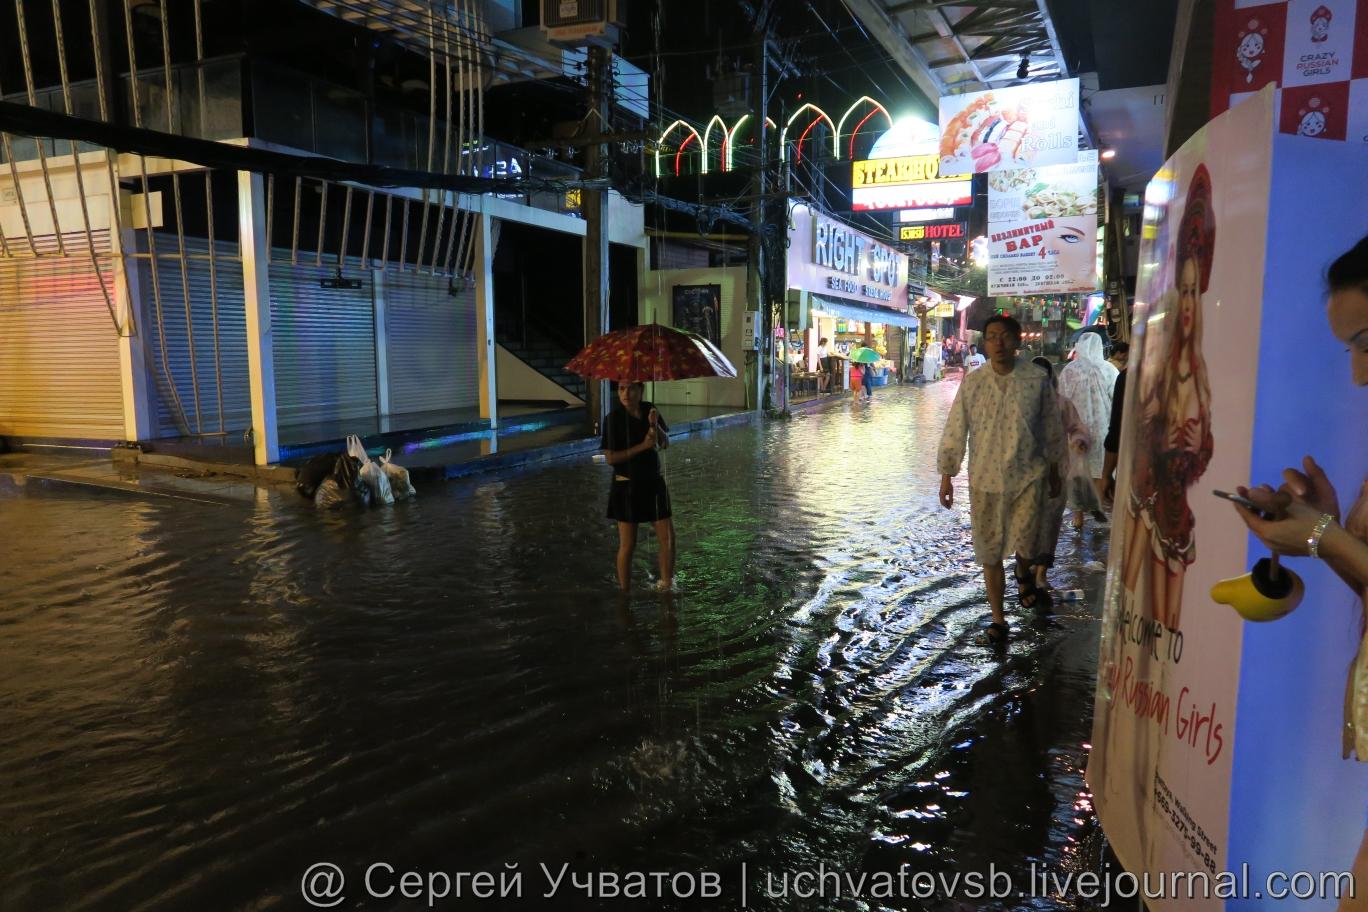 Walking Street в Таиланде (Паттайя) смыло дождем 9